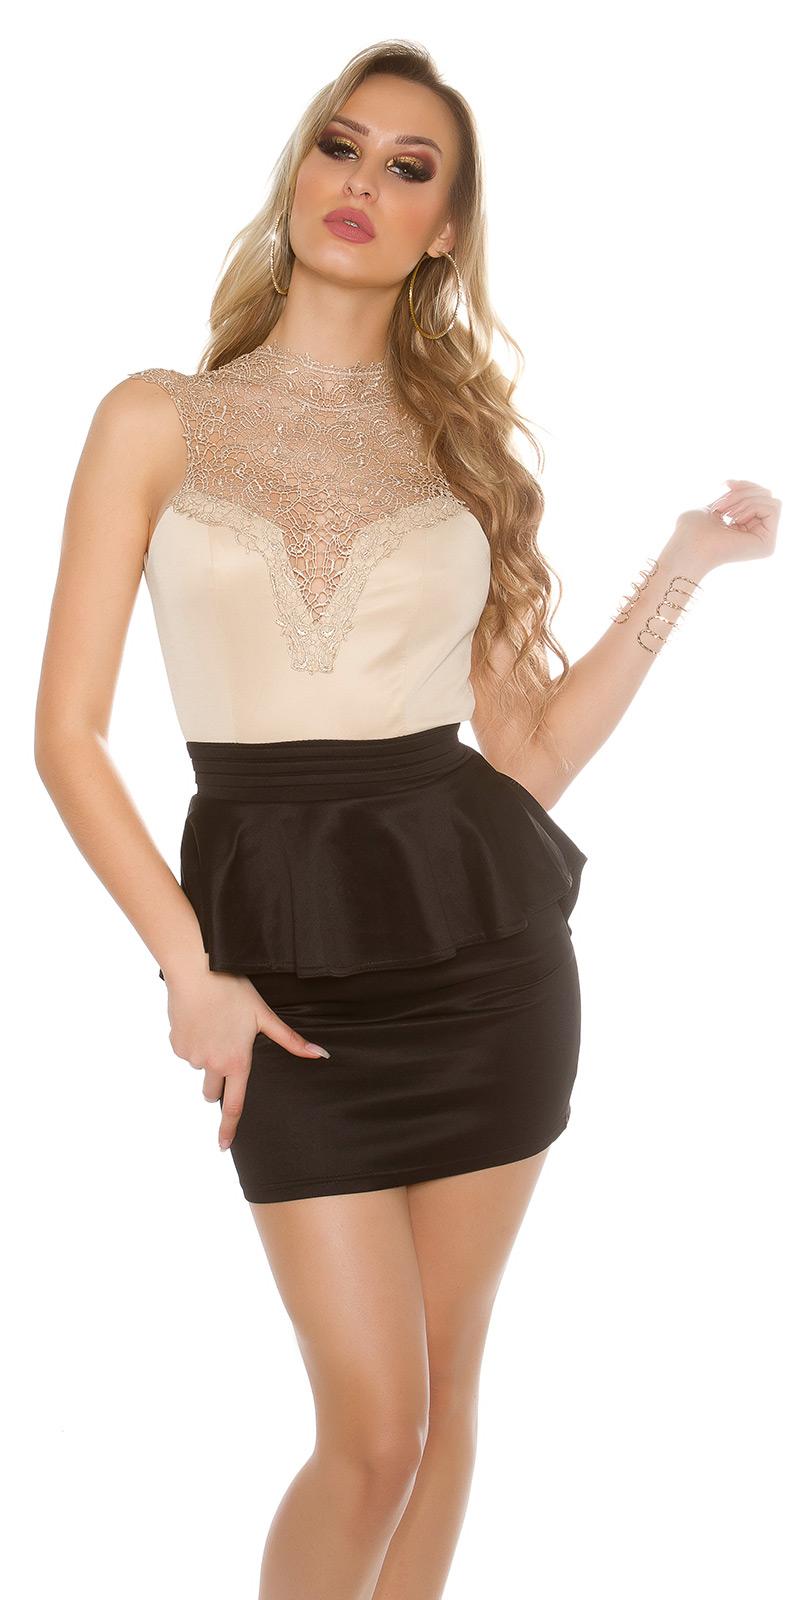 Rochie mini sexy cu dantela on chest